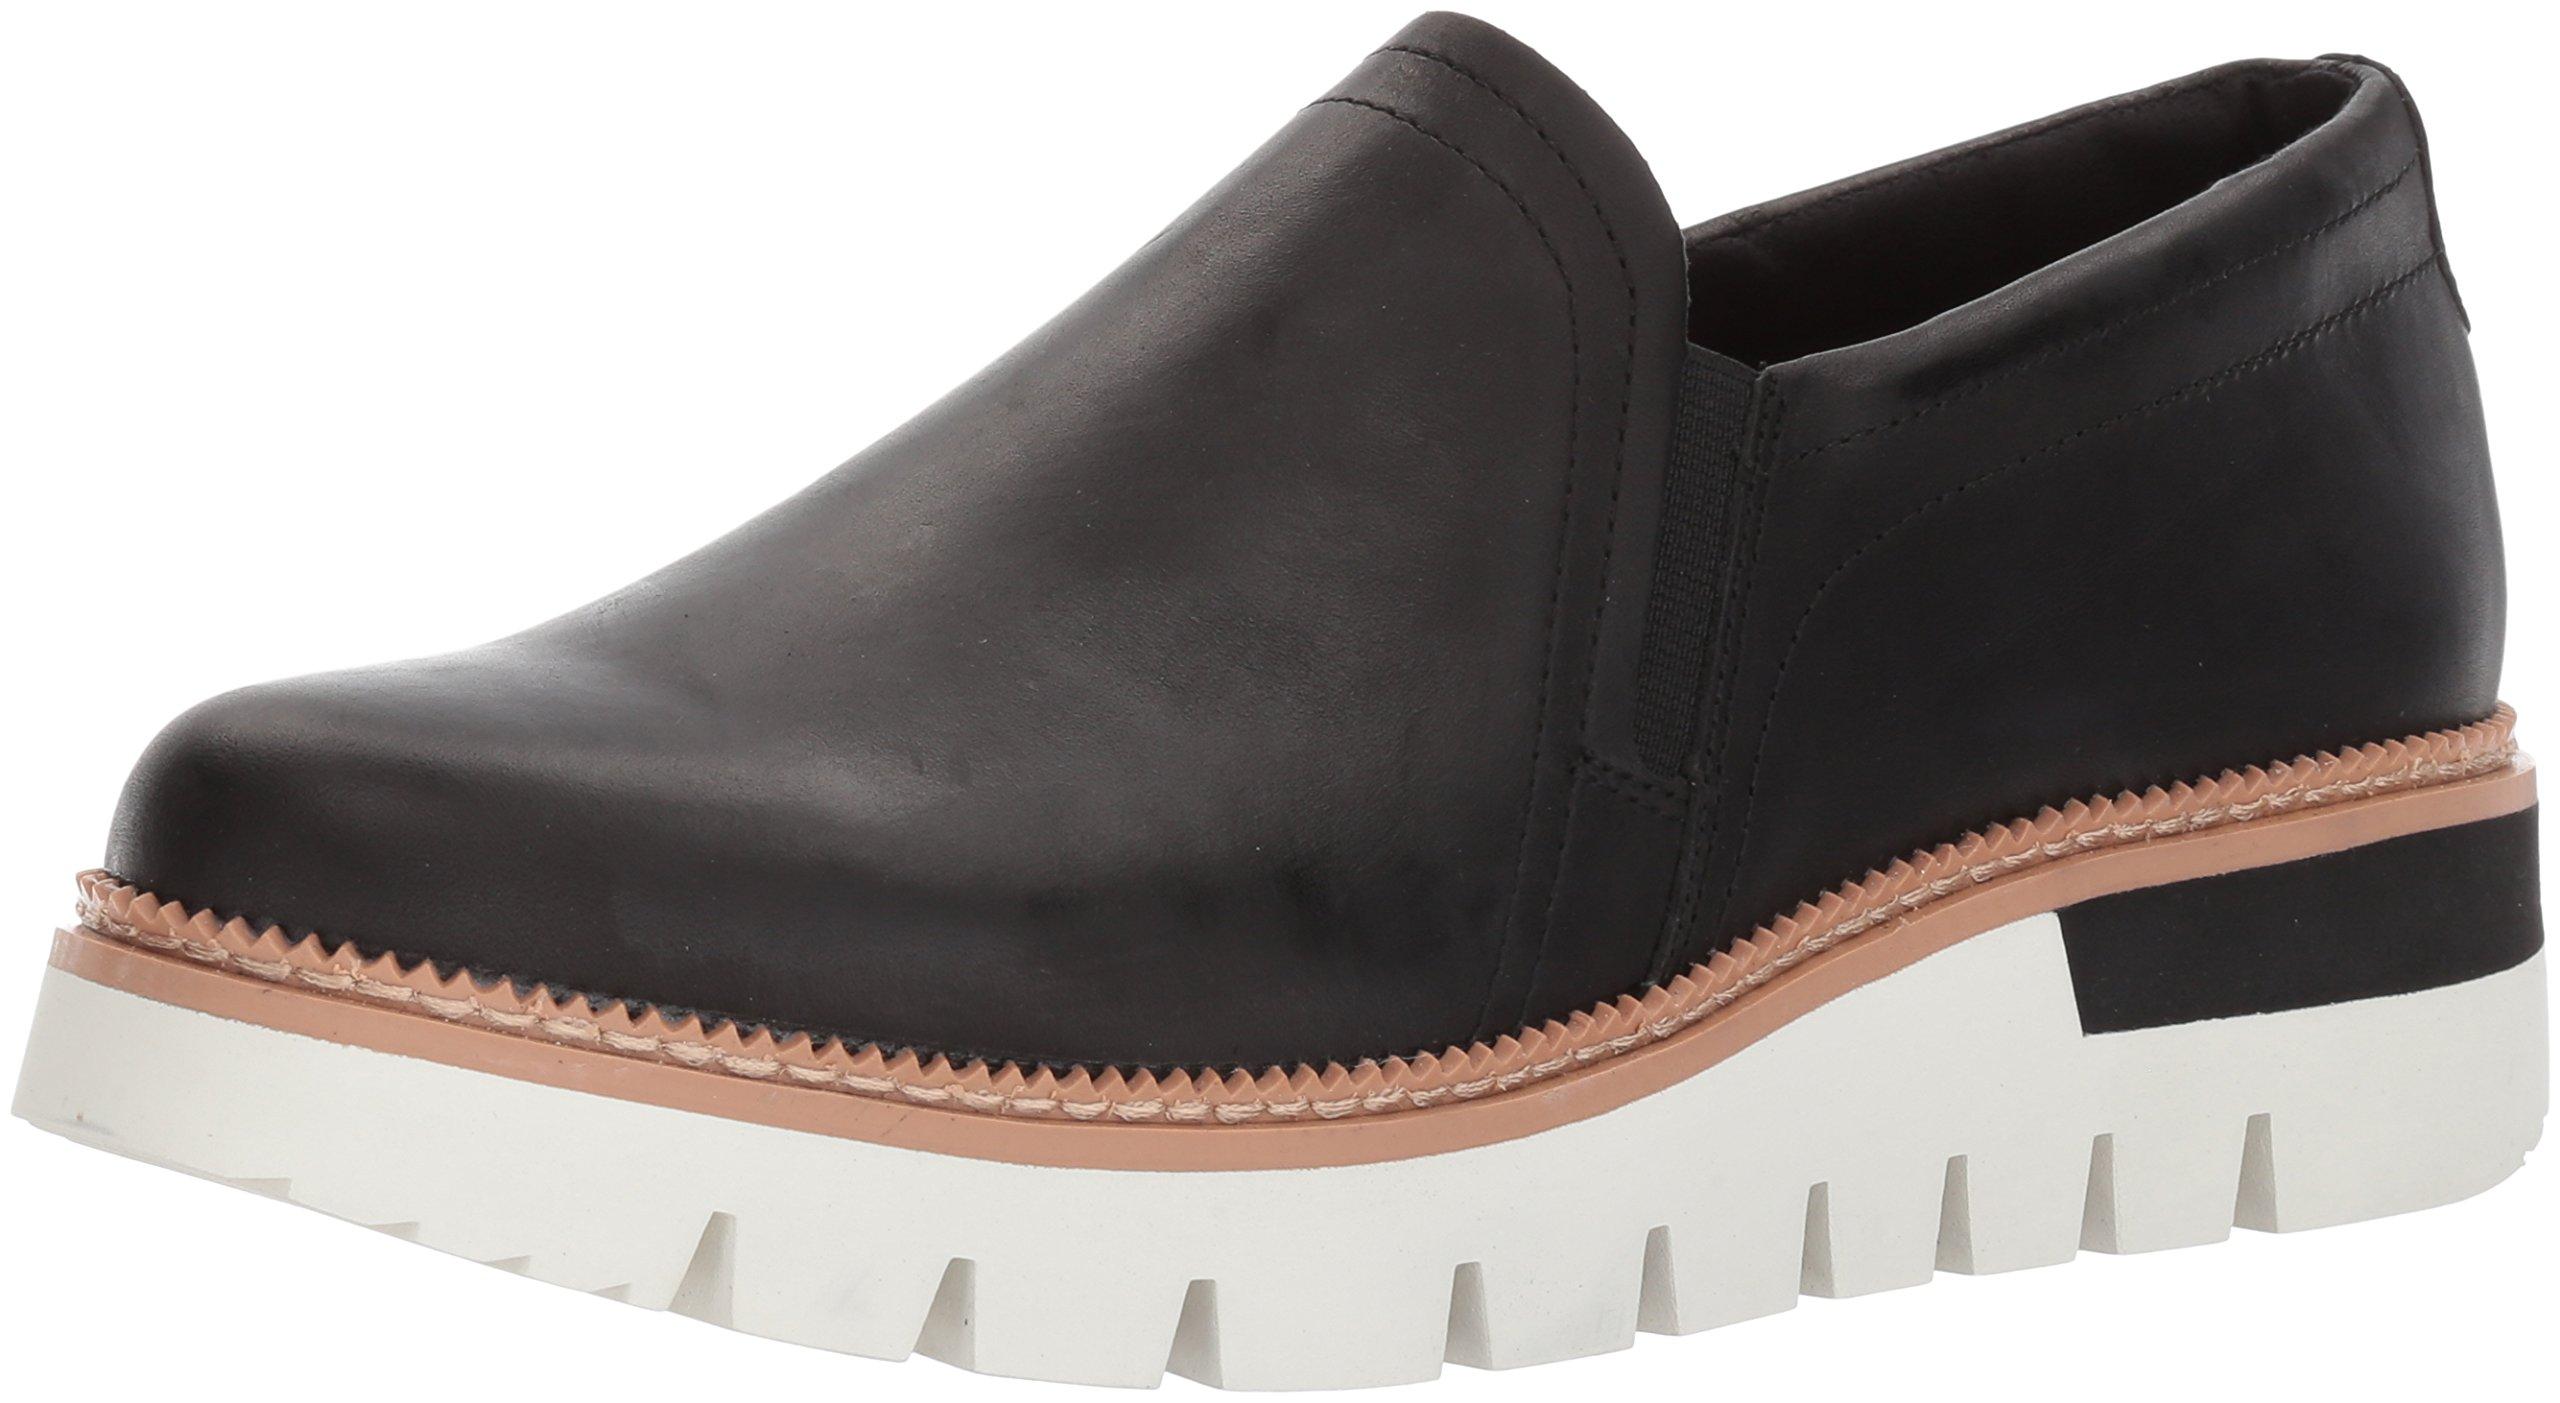 Caterpillar Women's Parody Leather Slip On Shoe Loafer, Black, 11 Medium US